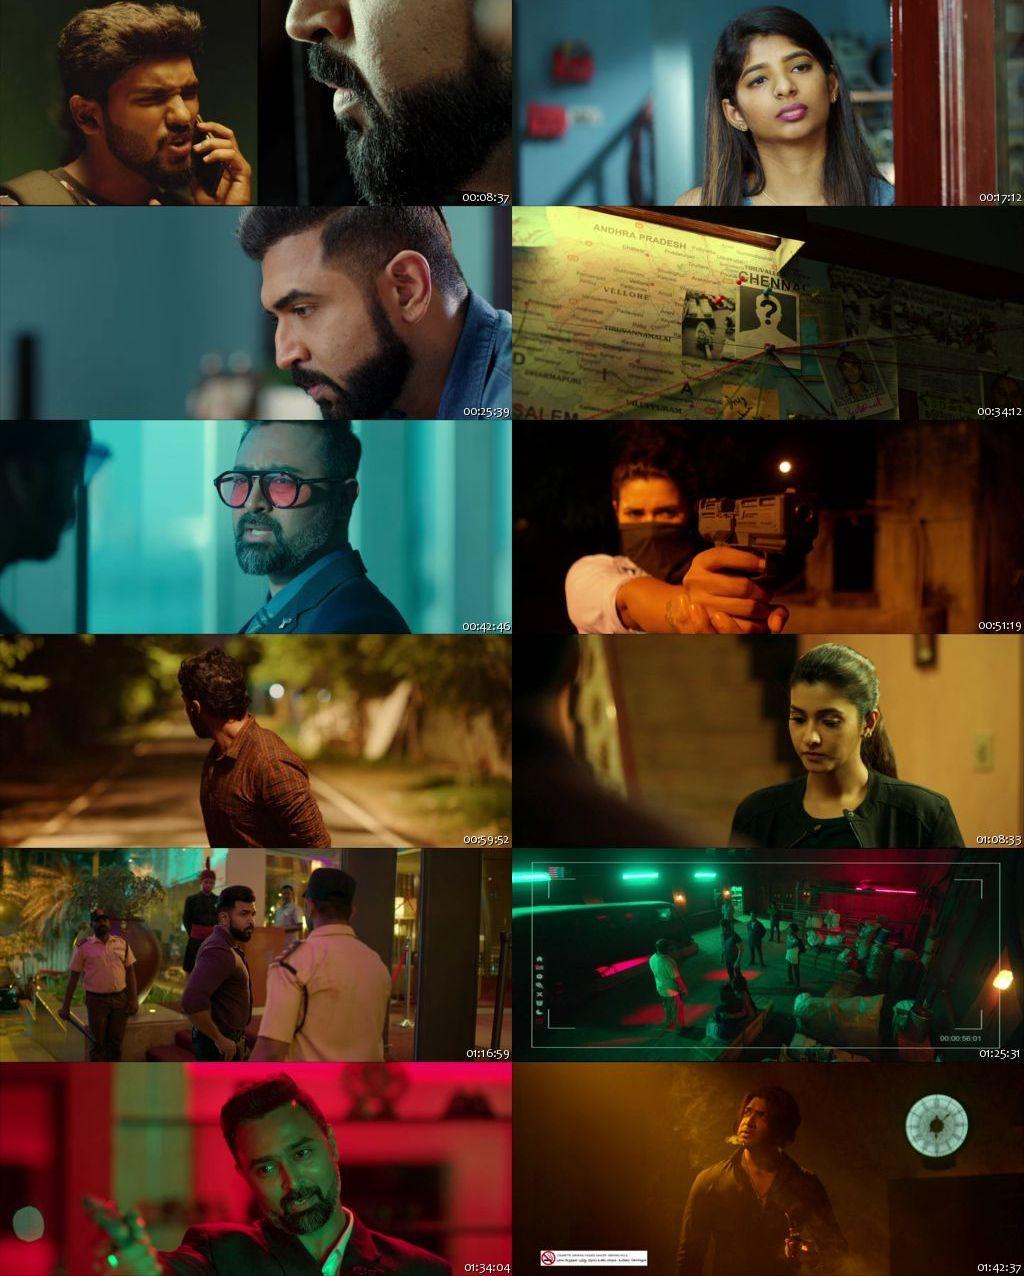 Mafia: Chapter 1 2020 Full Hindi Dubbed Movie Online Watch